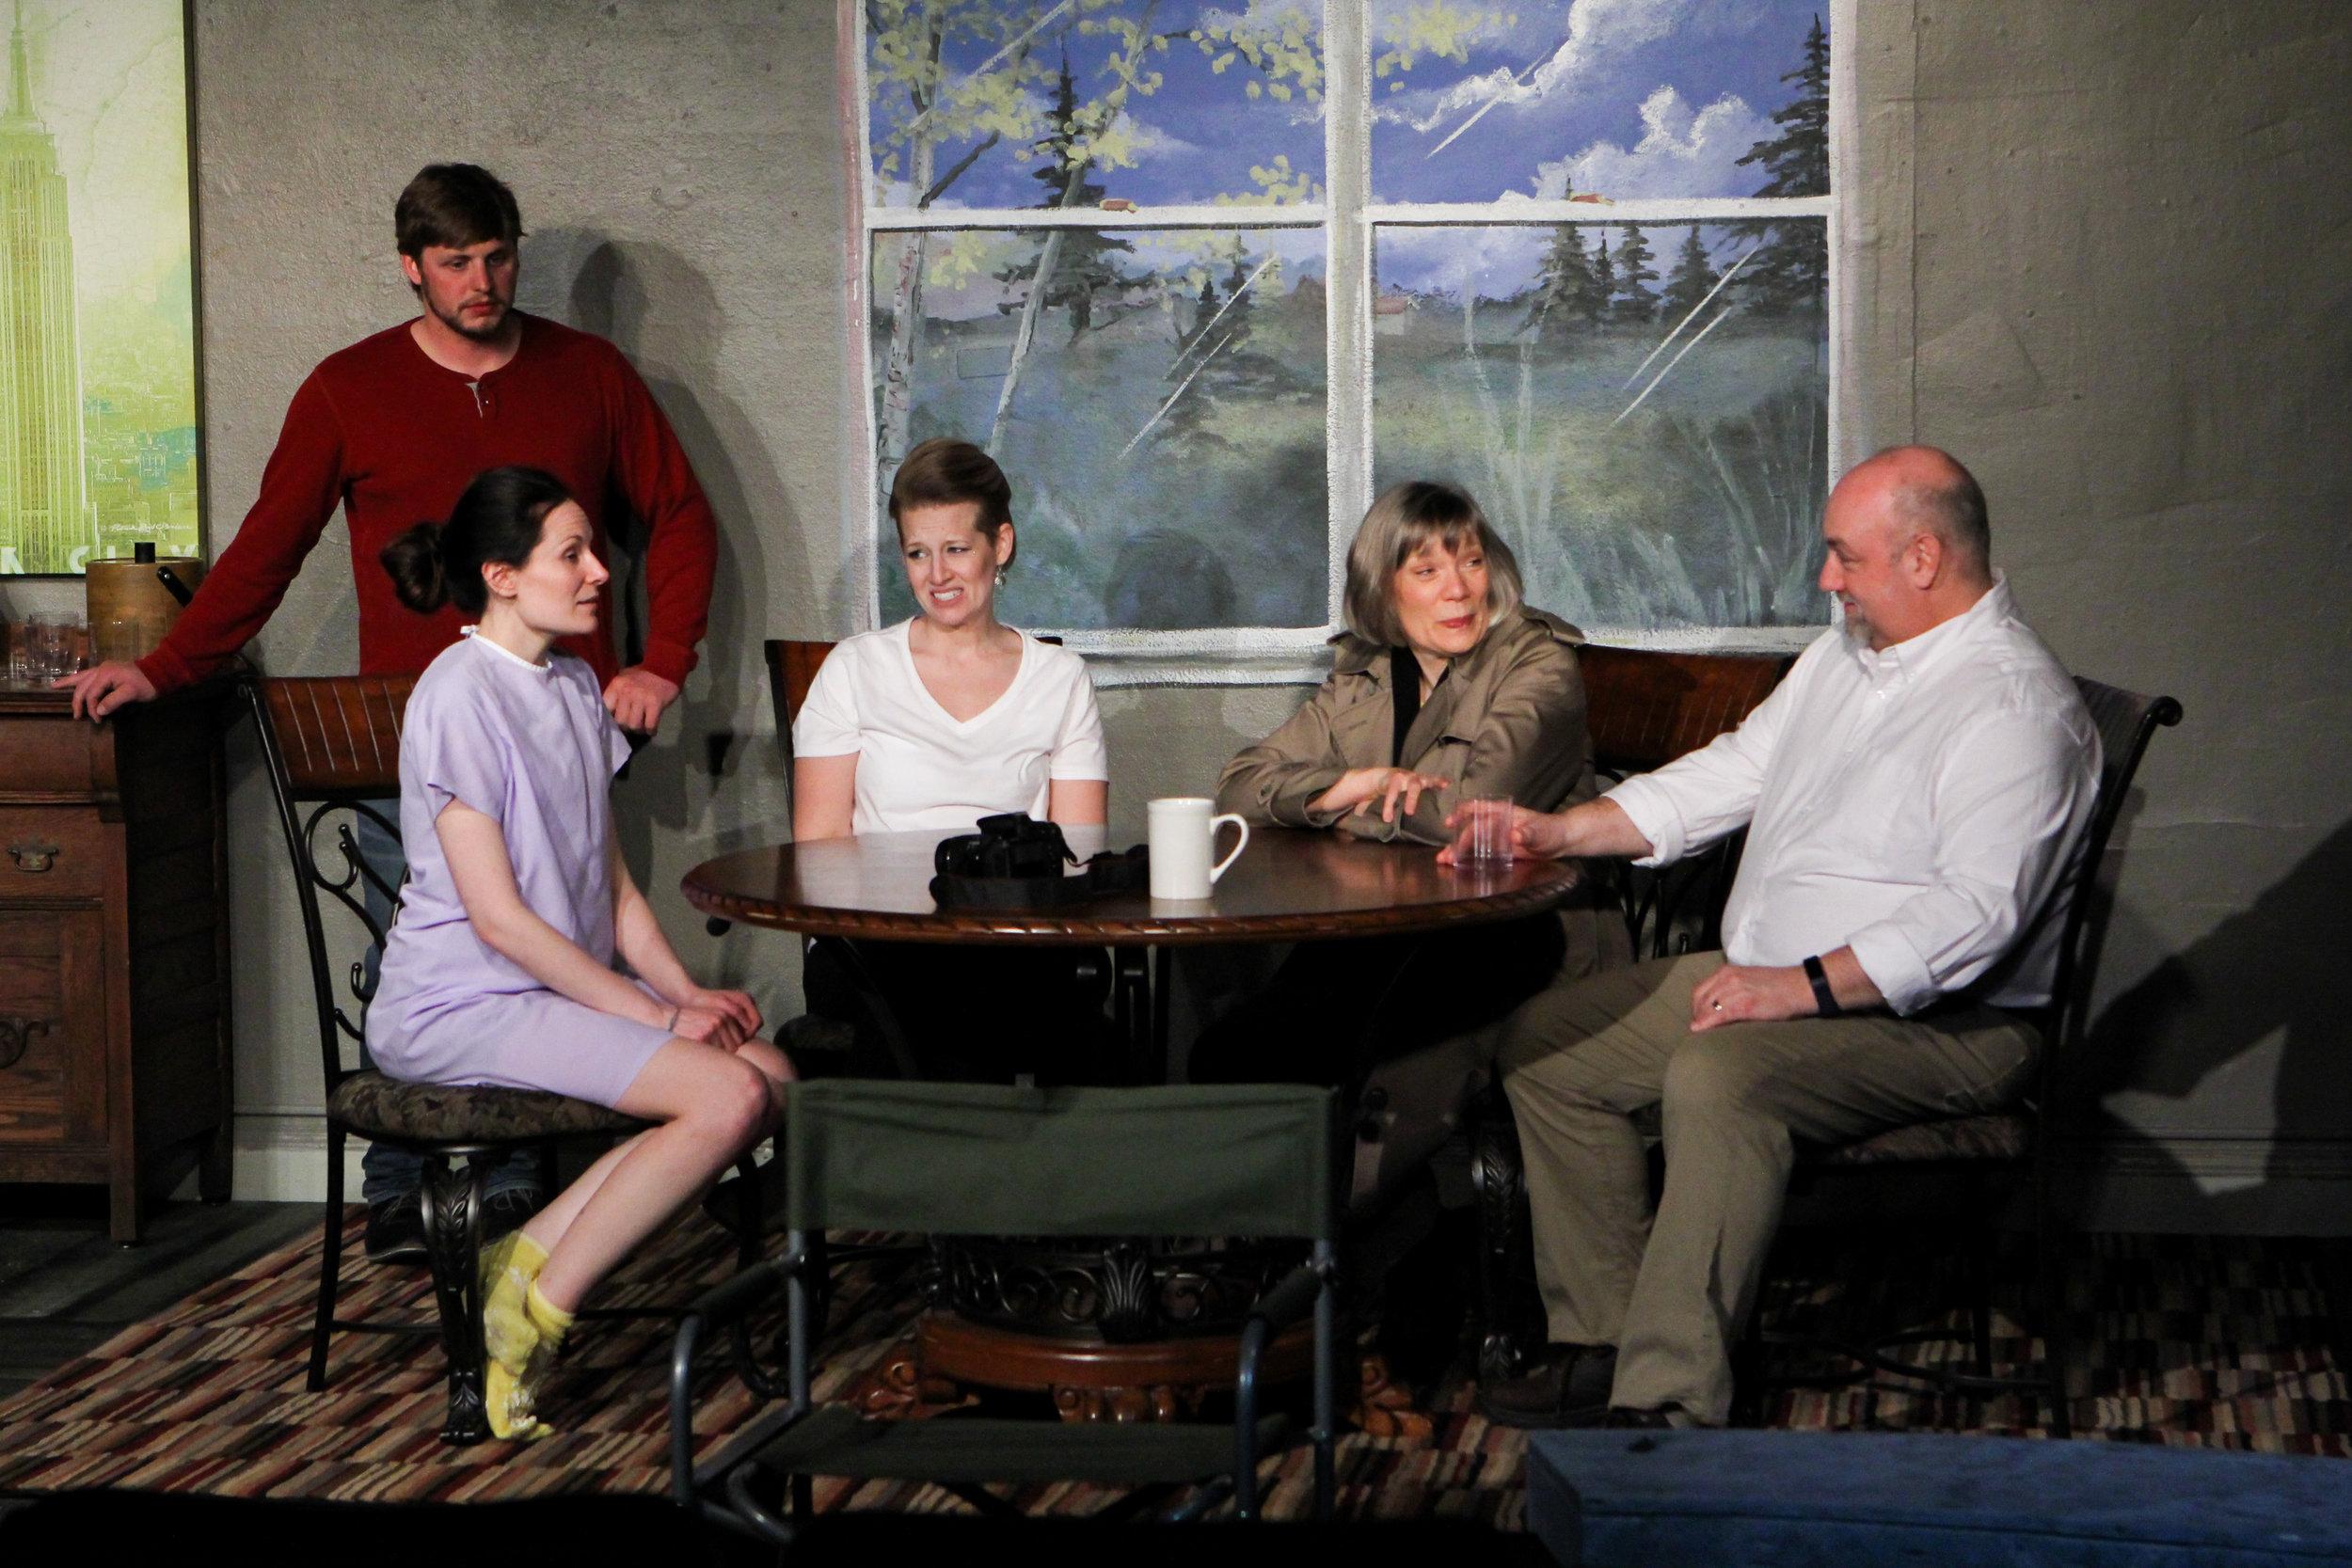 Jack (Zachary Klahn) hovers over his family — Sammy (Cayla Anderson), his mom (Sara Sarna) and dad (Bob Fuchs) as they meet with the recipient of his heart, Joy (Alyssa Falvey), left.